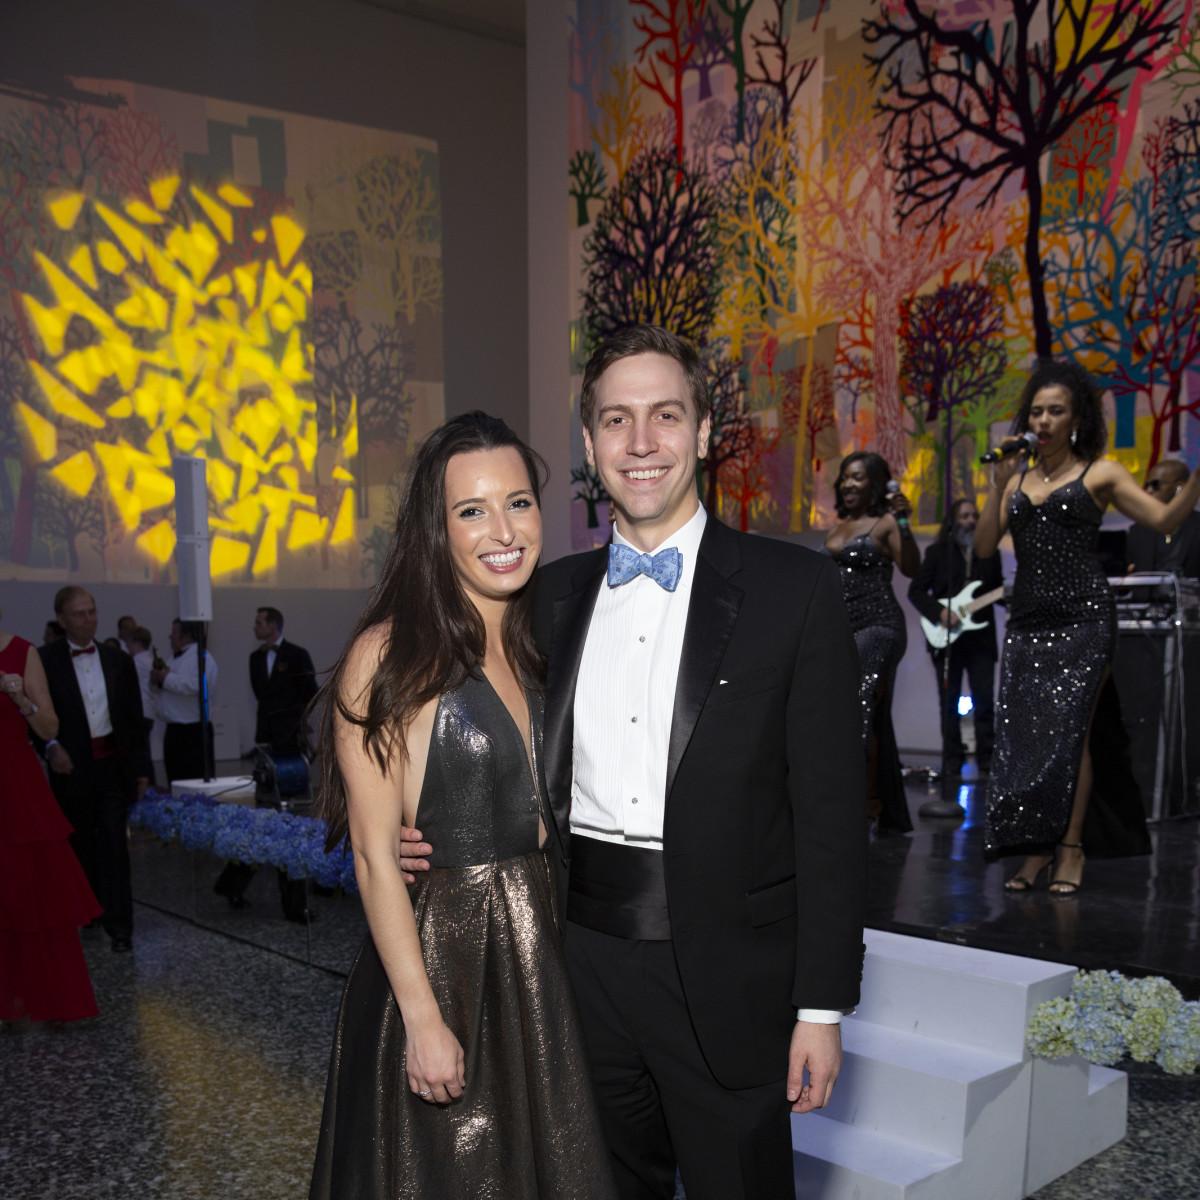 MFAH Grand Gala Ball 2019 Seagren Wilson Harris Pritchard